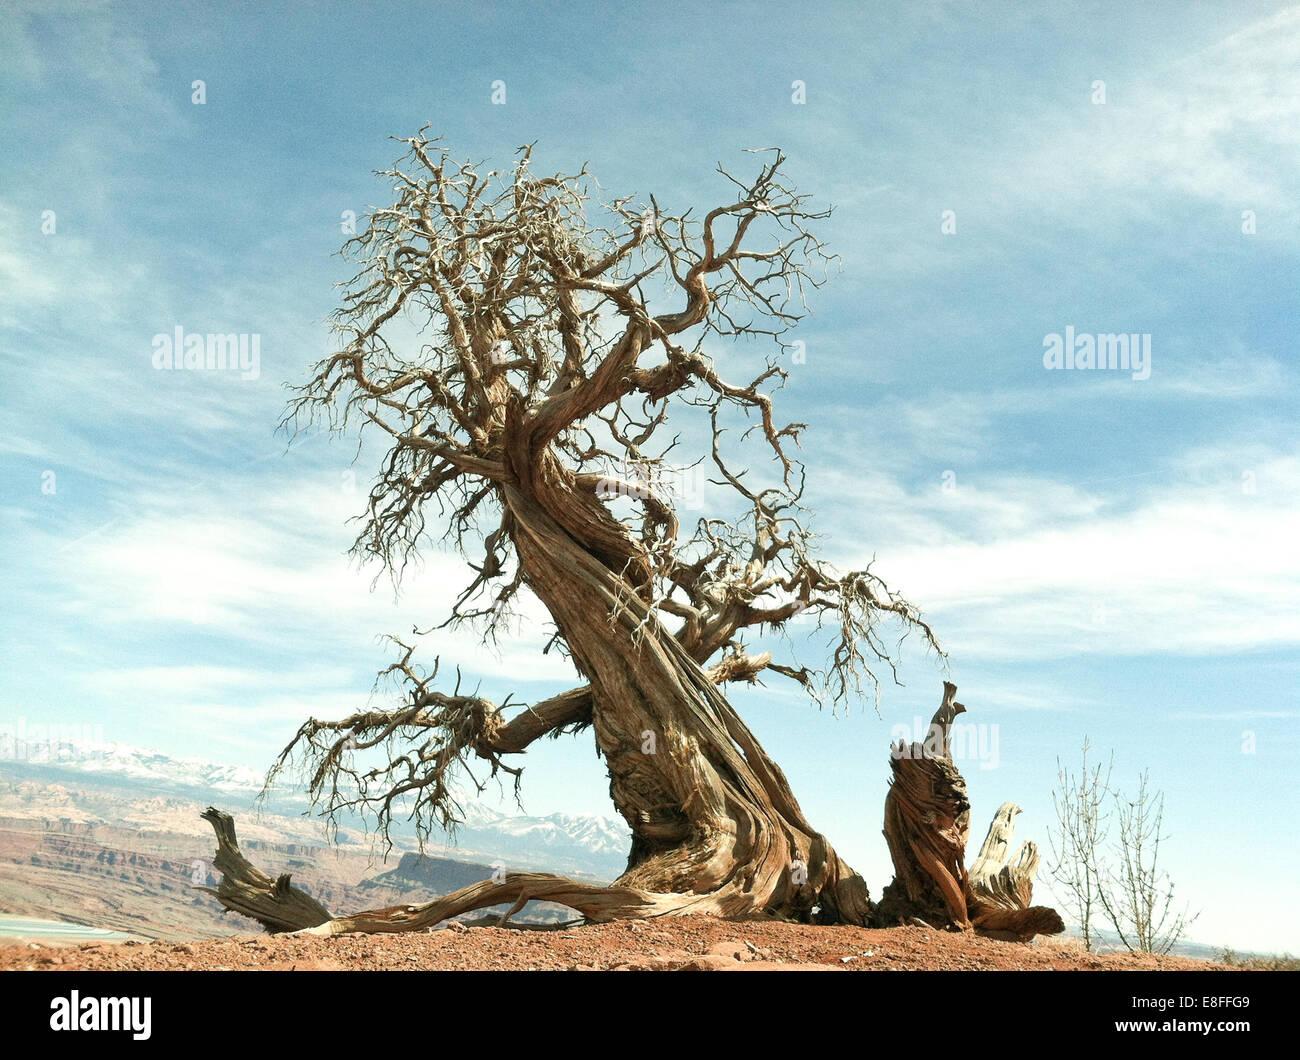 Dead tree, Dead Horse Point State Park, Utah, America, USA - Stock Image